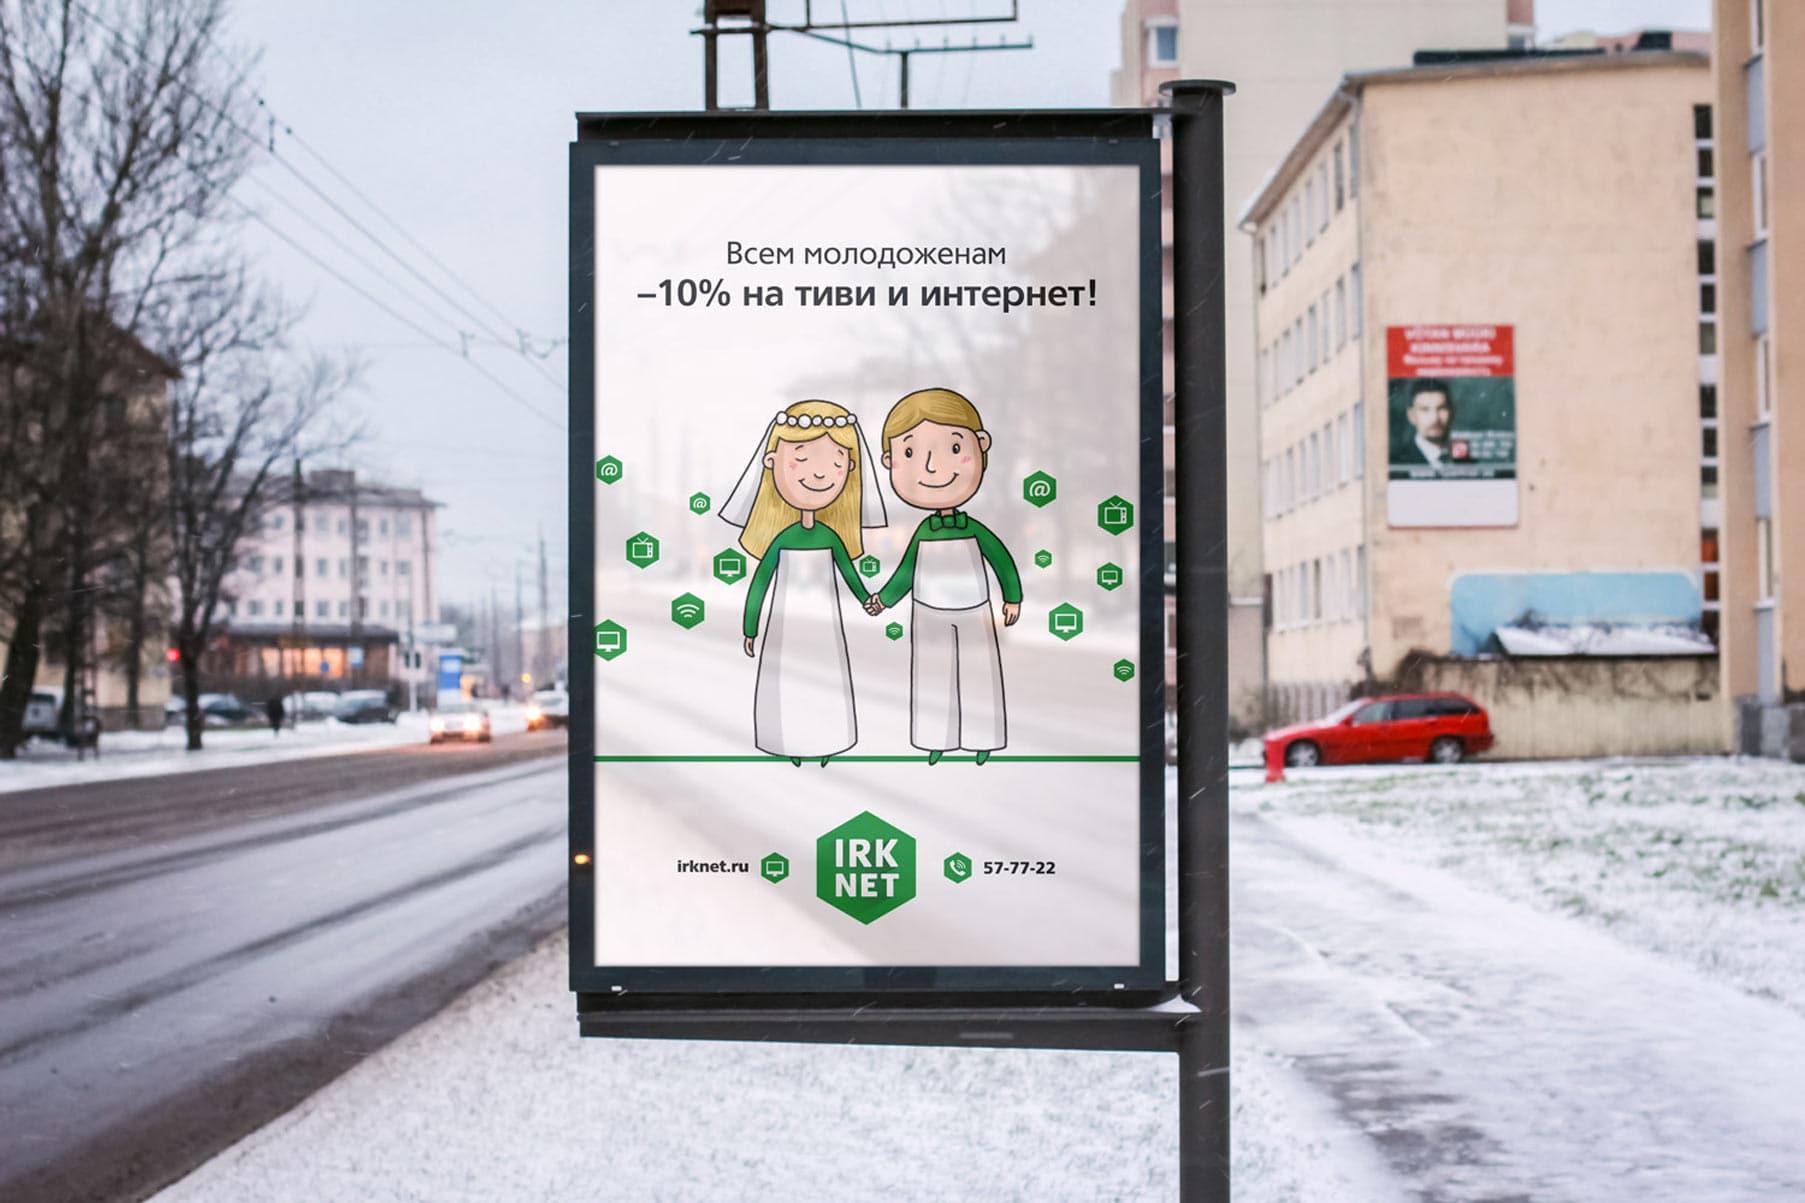 Artjuice.ru | Irknet, Иркнет, Иркнэт